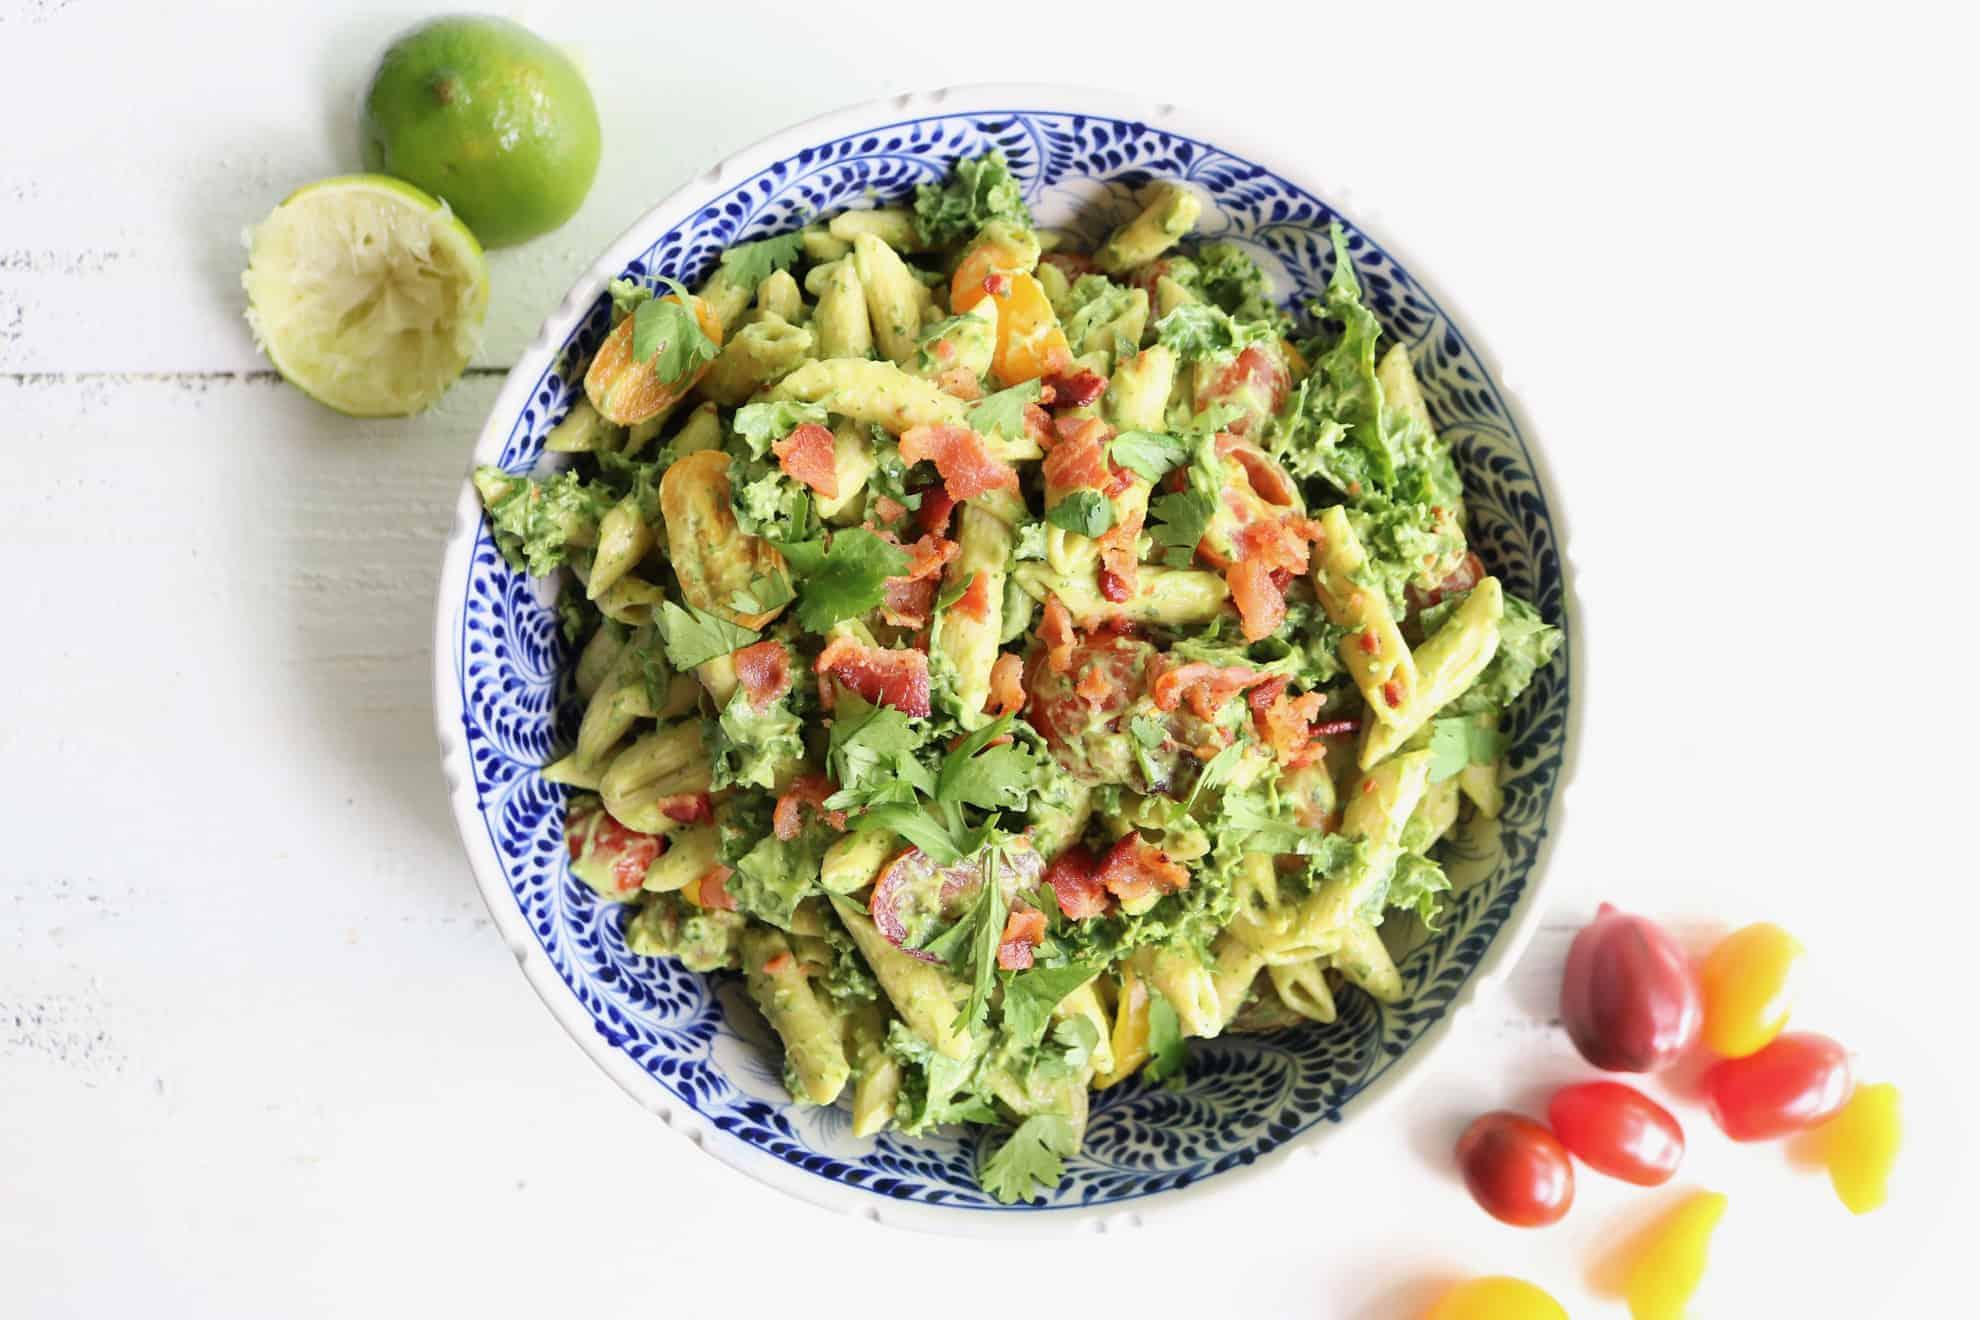 BLT Chickpea Pasta Salad + Creamy Avocado Sauce